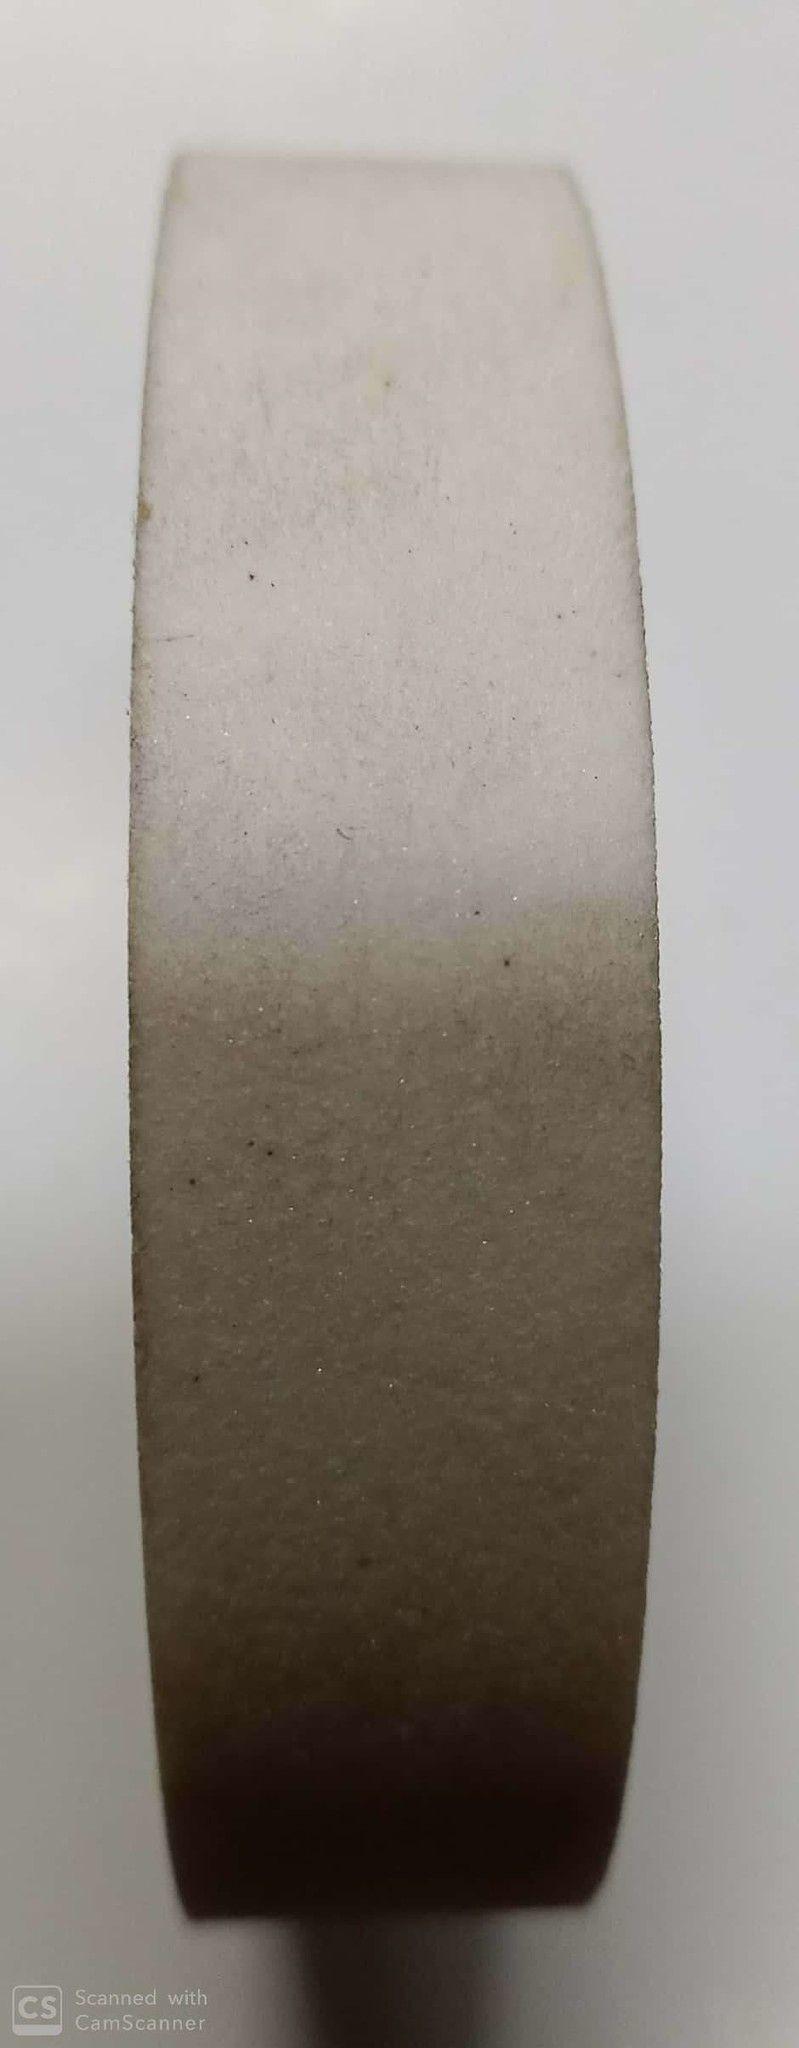 Mola abrasiva ad acqua ø 100x20 foro 16 mm gr 100